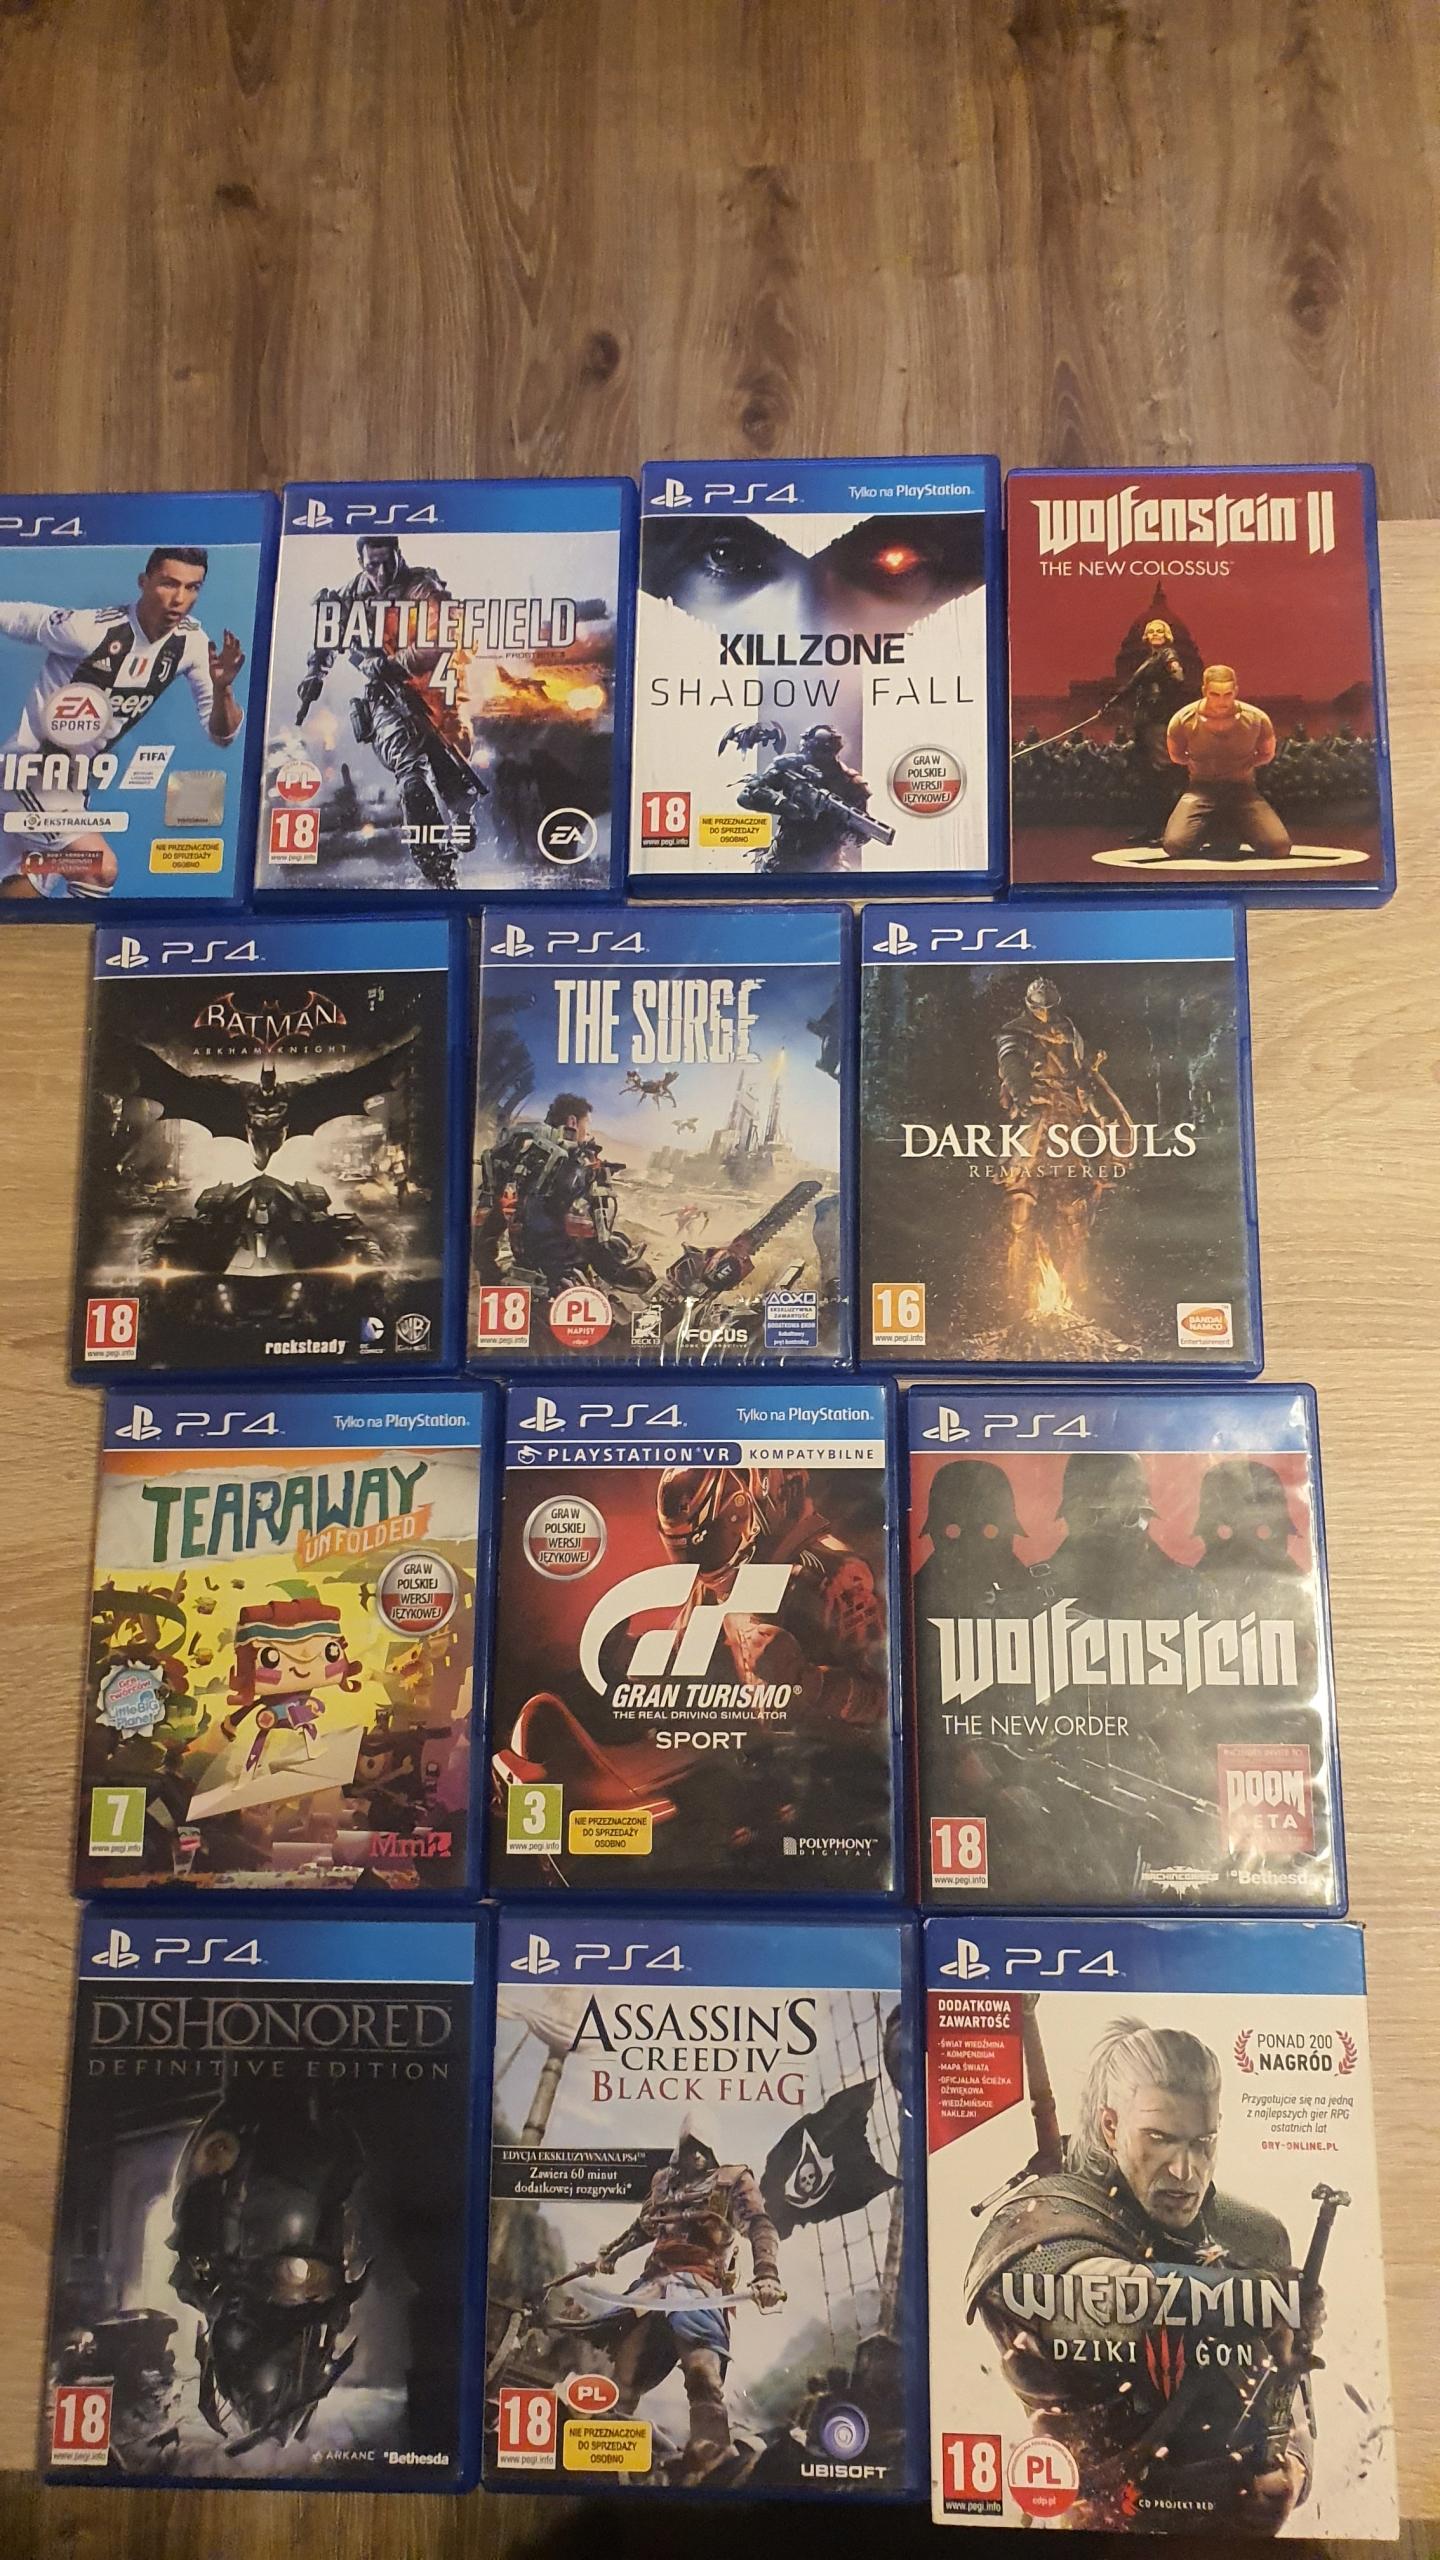 Item Zestaw 13 gier na konsole PlayStation 4 BCM